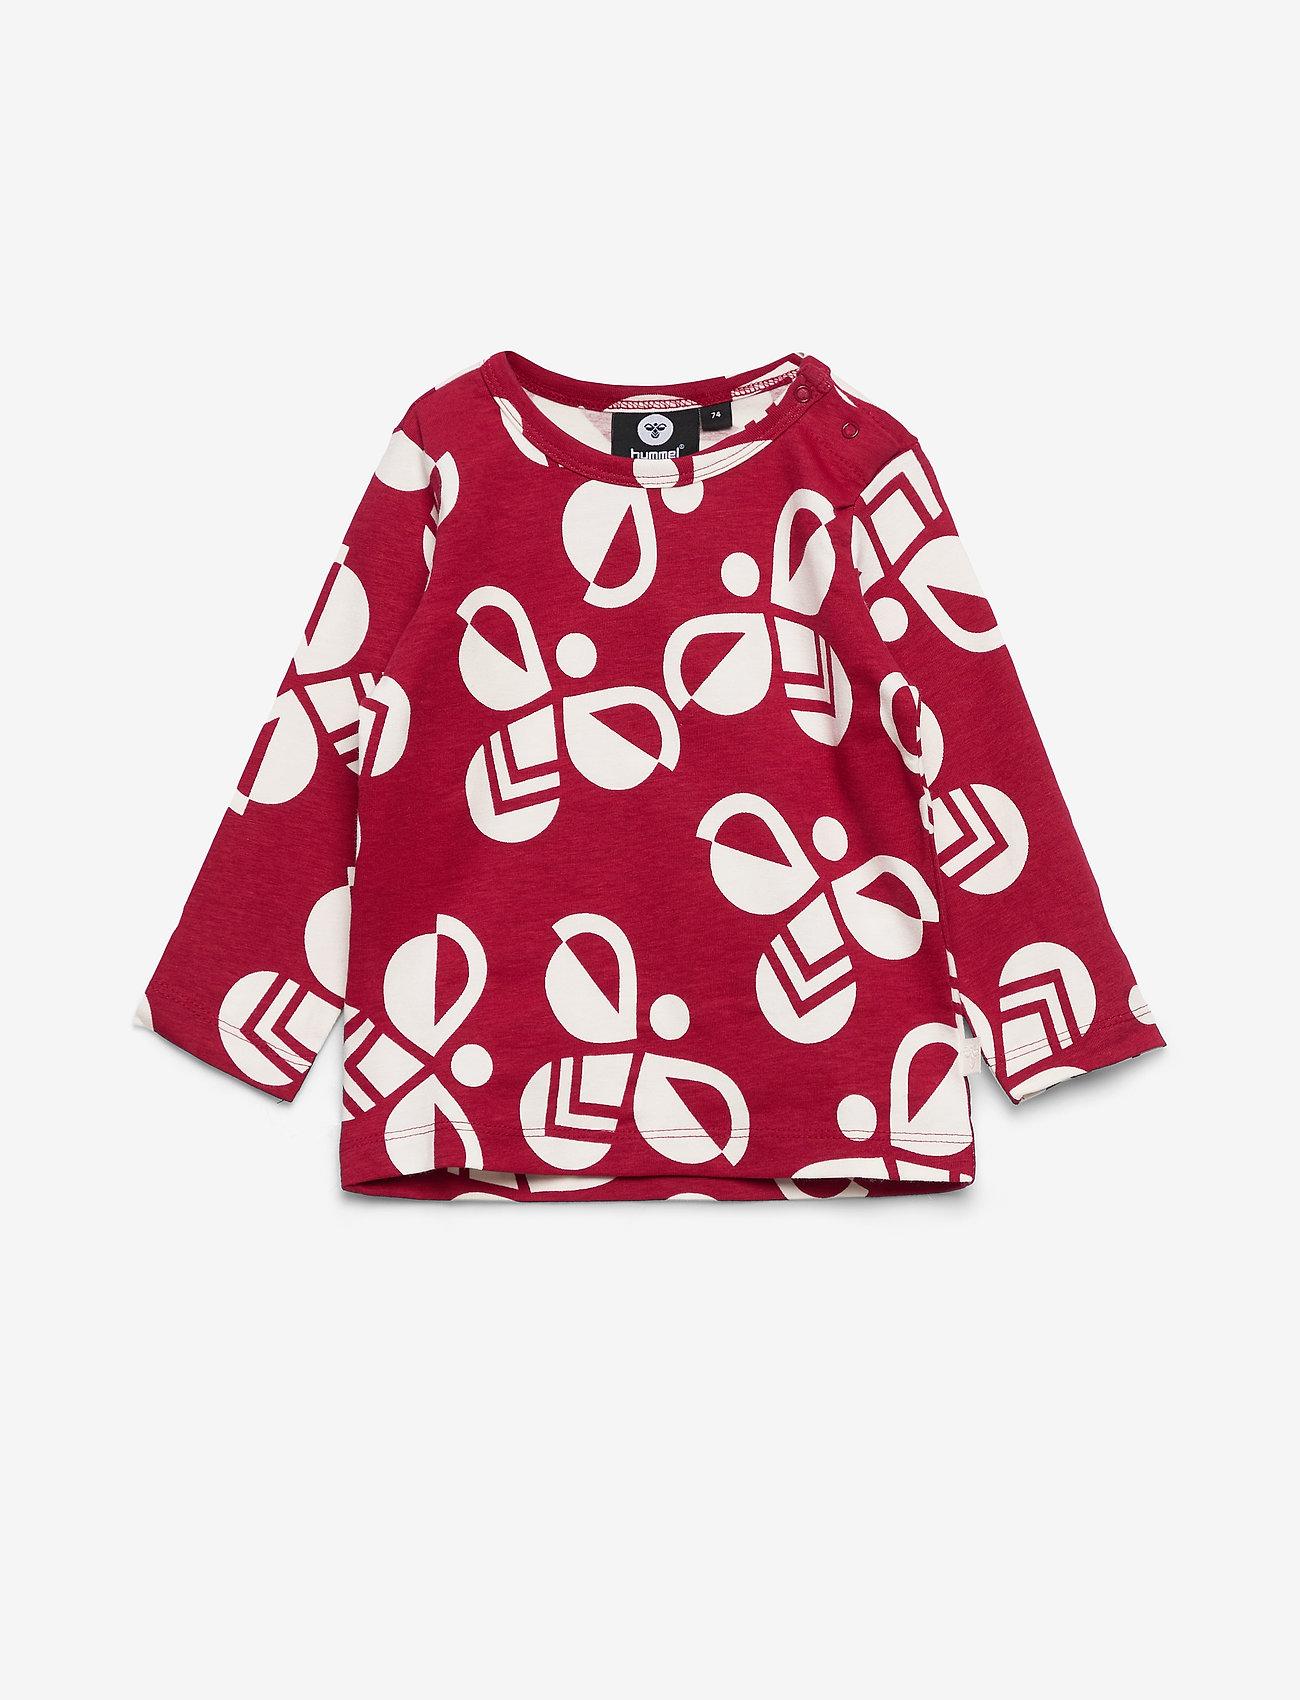 Hummel - hmlCHARLIE T-SHIRT L/S - long-sleeved t-shirts - rio red - 0